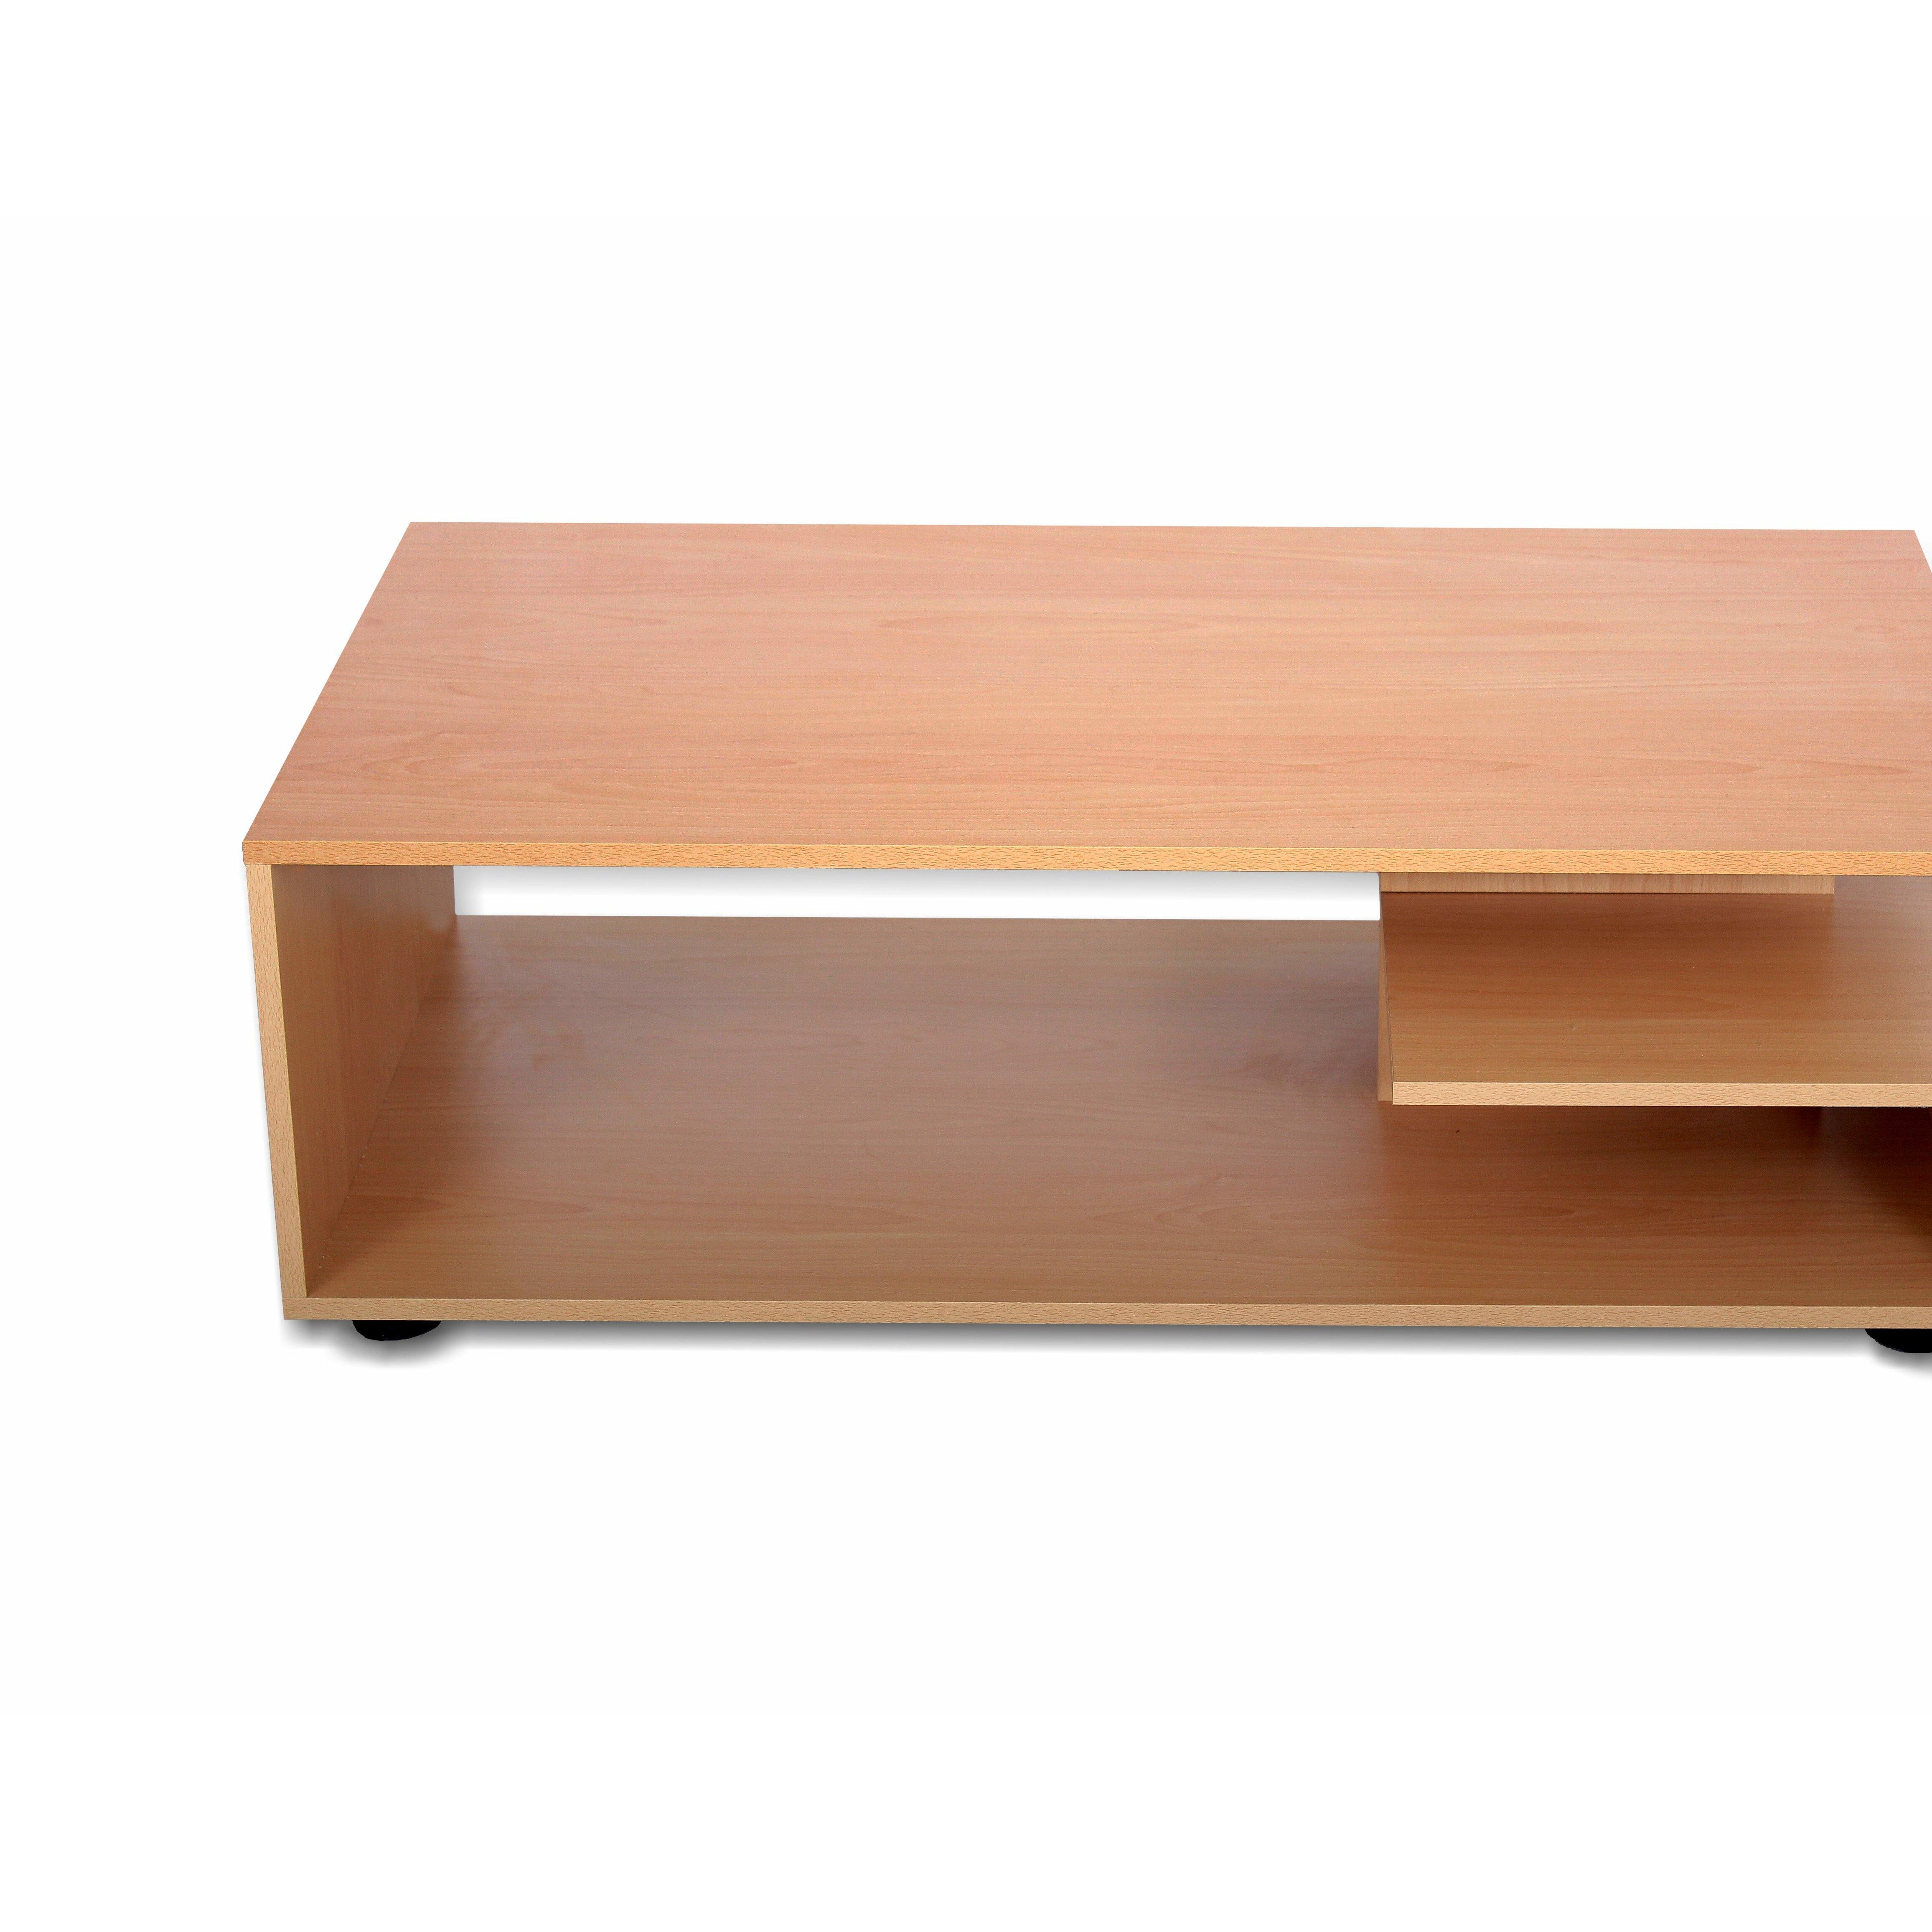 Wayfair Glass Coffee Table Uk: AISEN Cantania Coffee Table